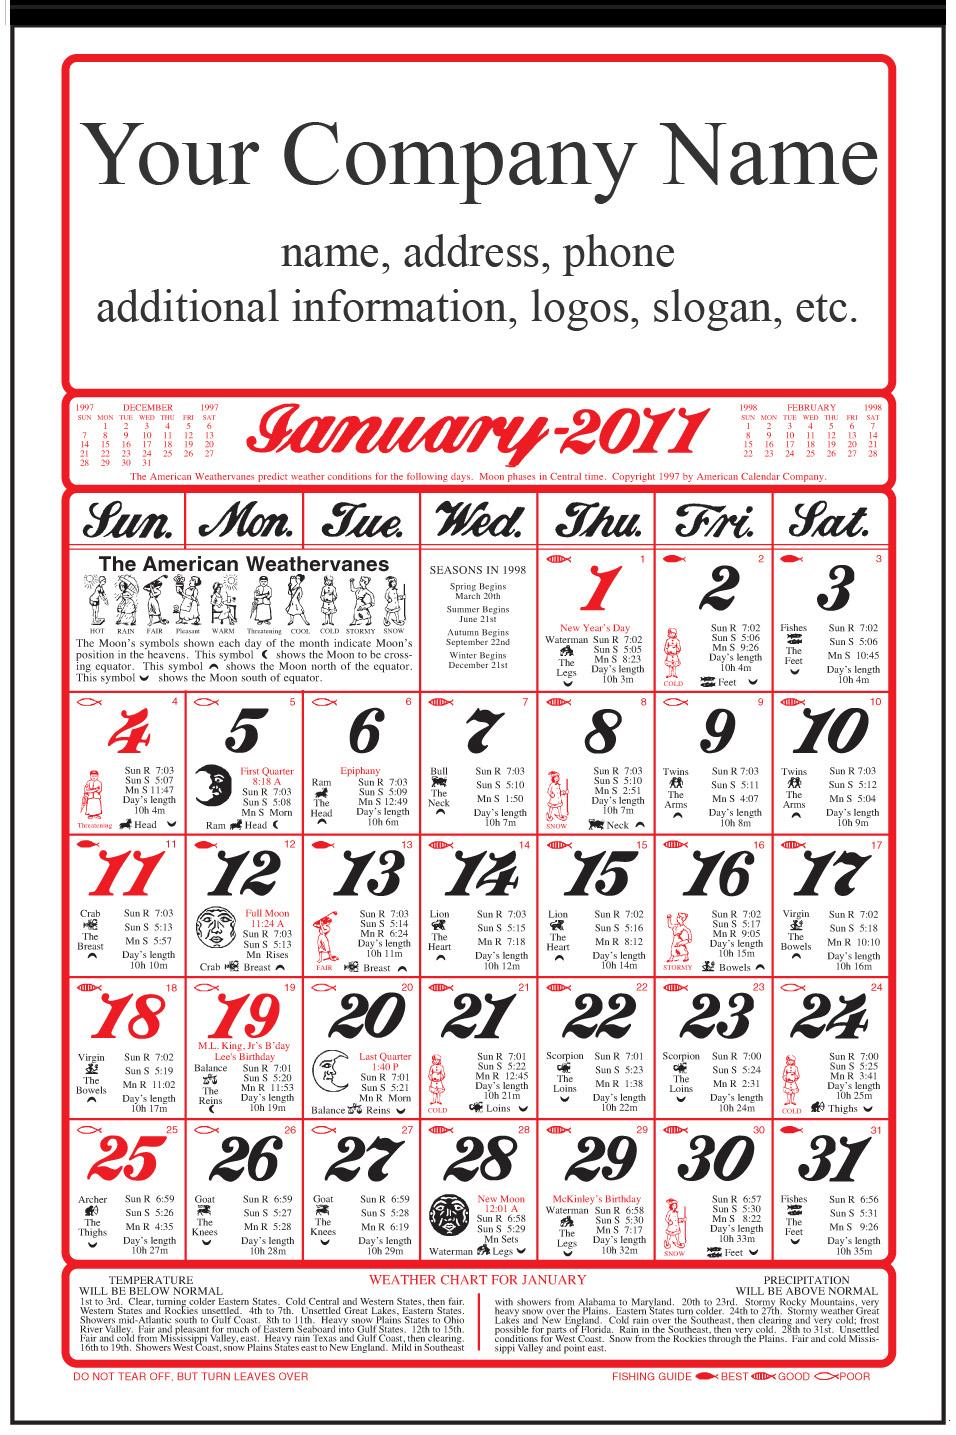 Almanac Calendar 2020 2020 Old Farmers Almanac Calendar: Calendar Company